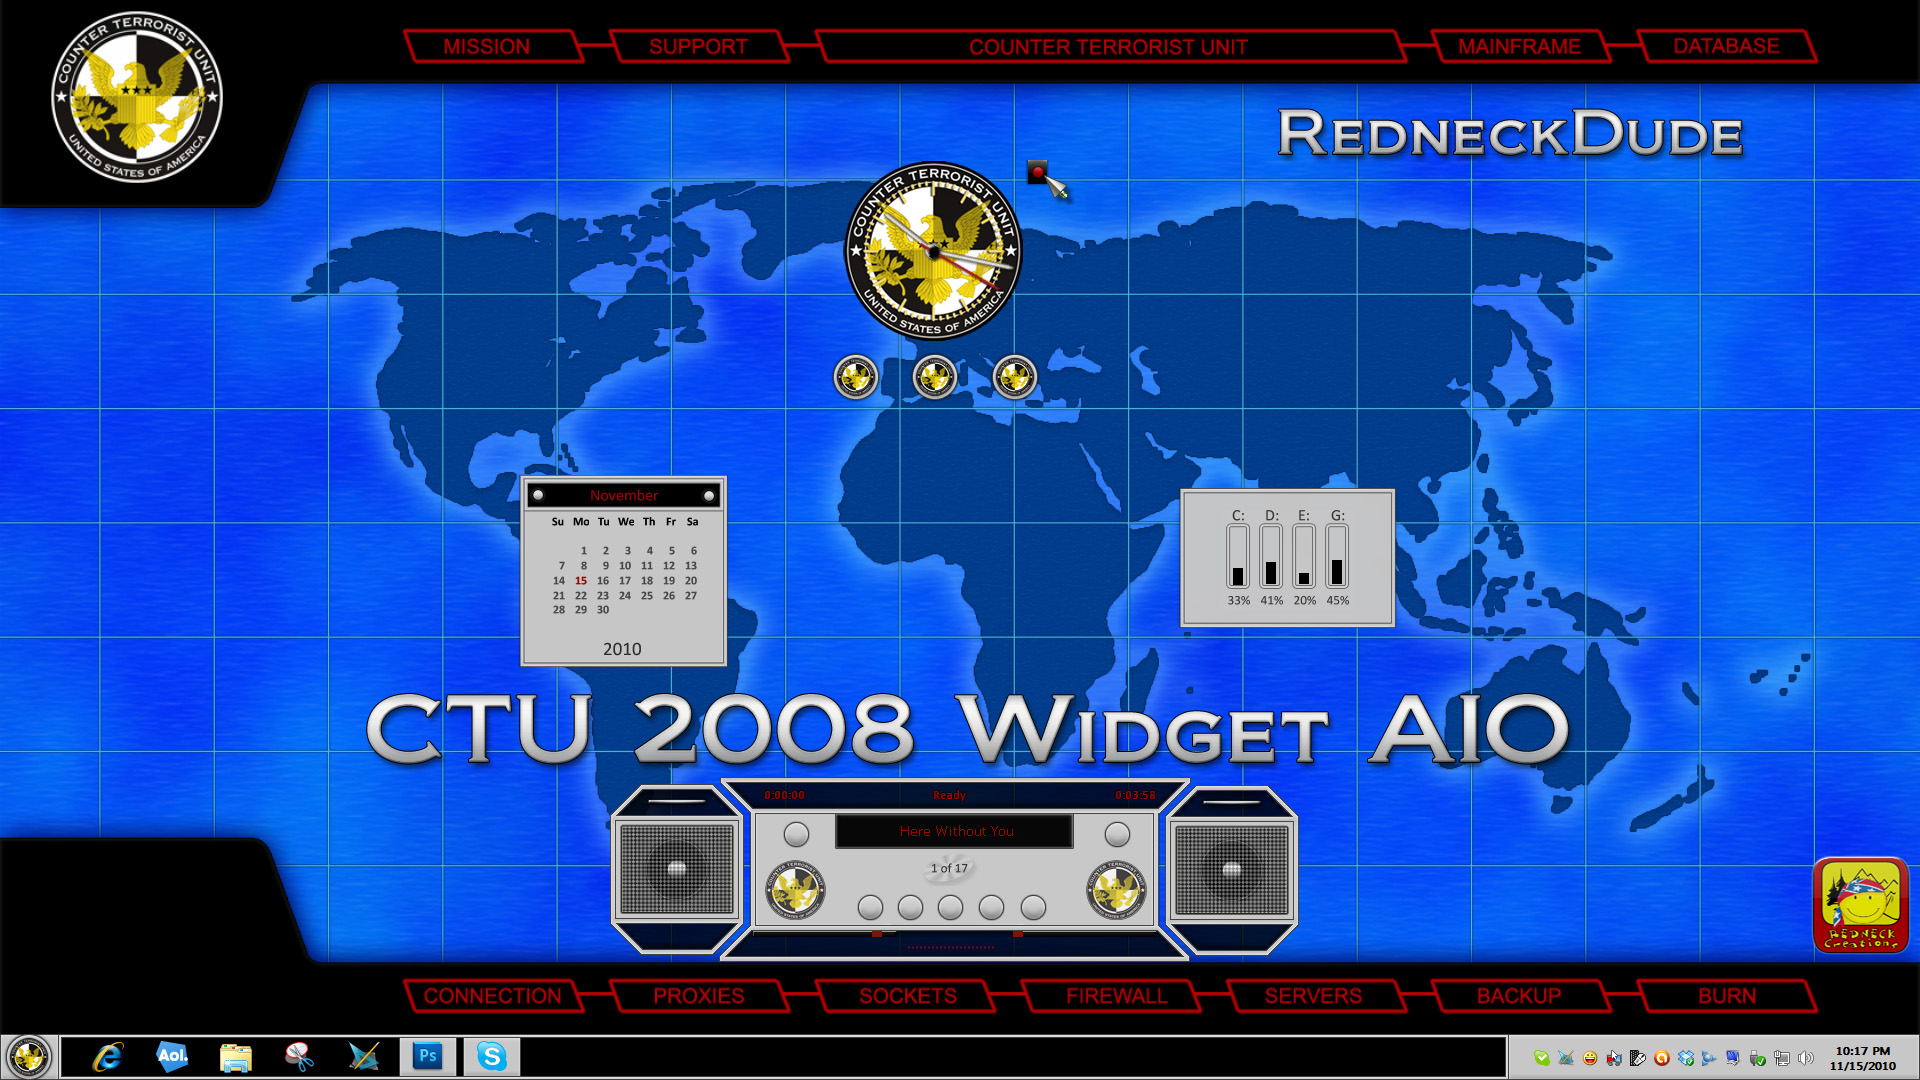 CTU 2008 Widget AIO